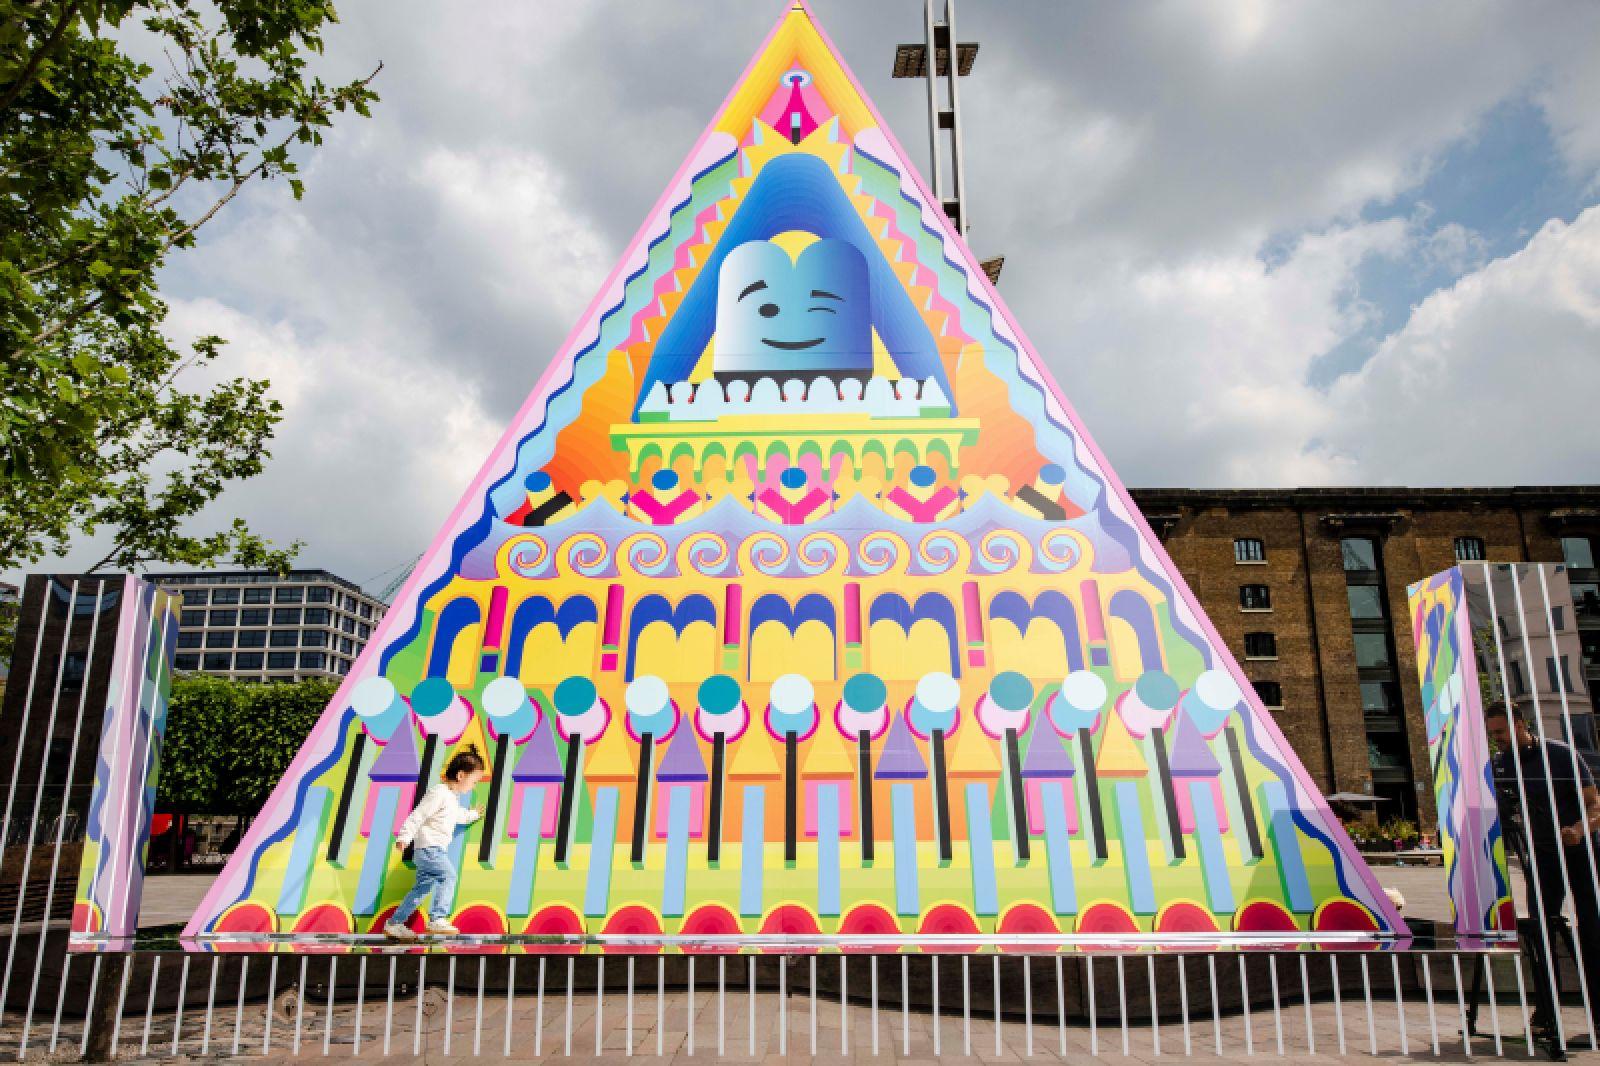 Proud Little Pyramid